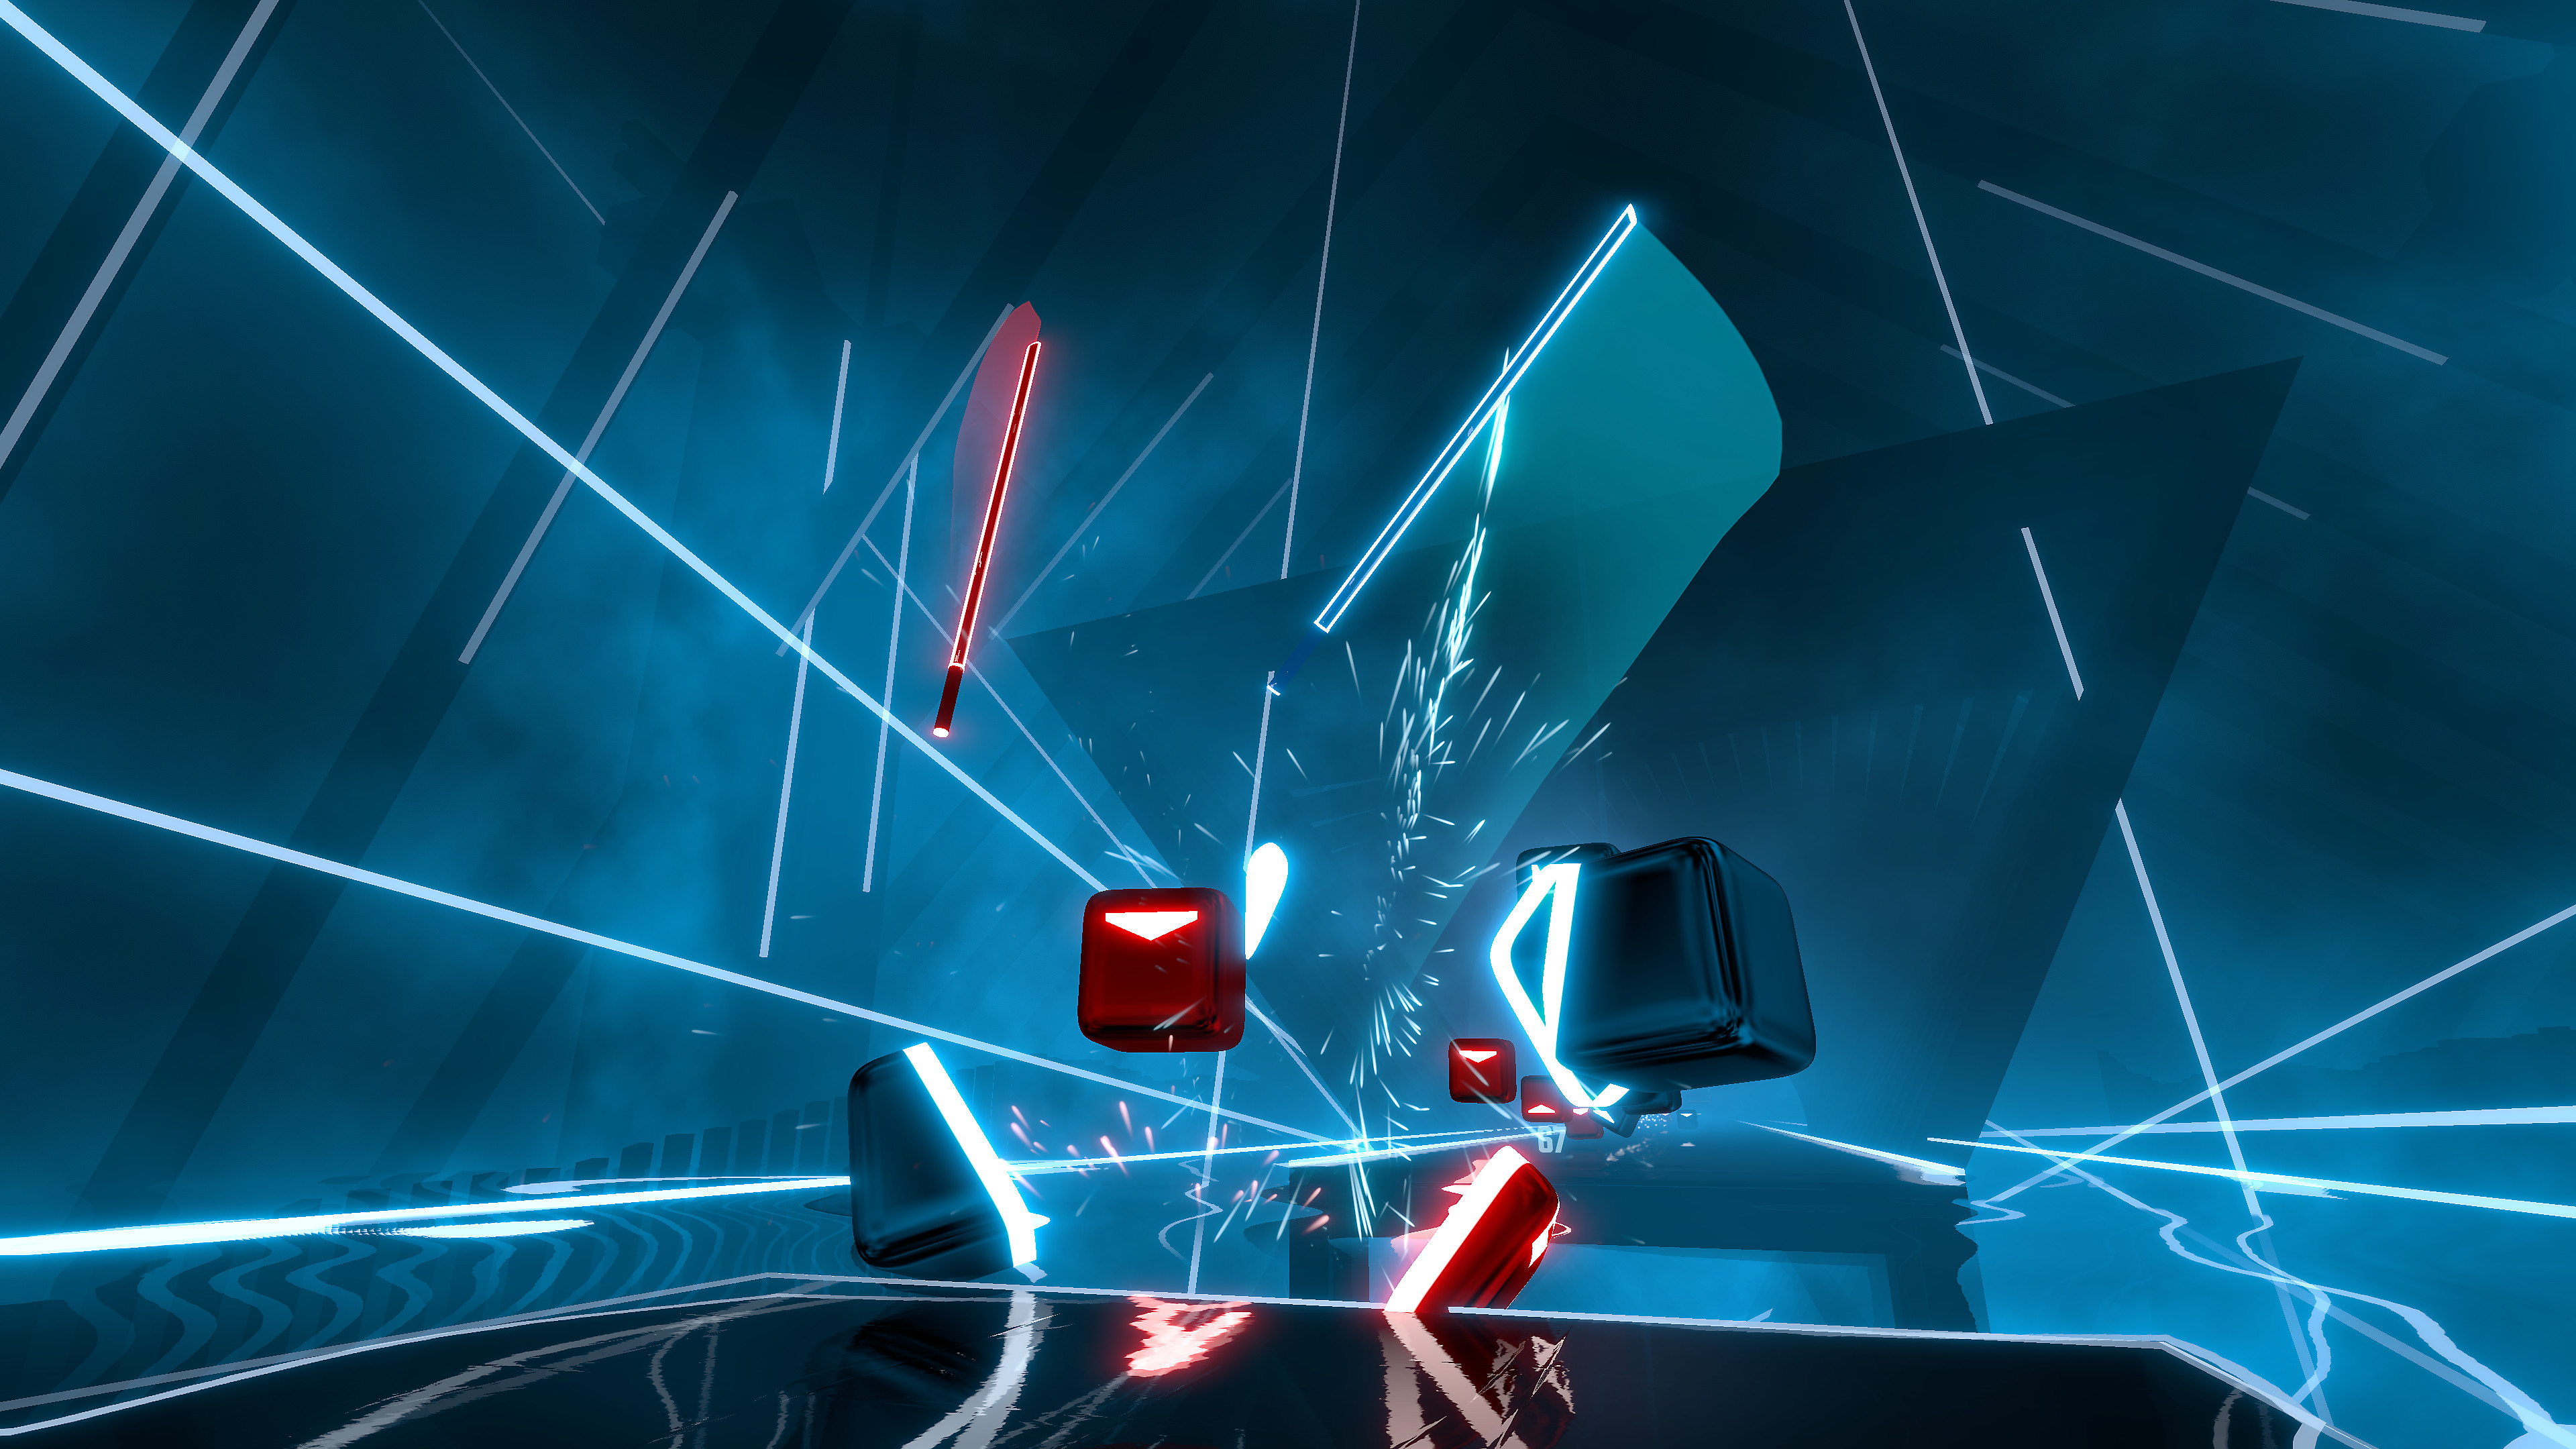 Beat Saber Game | PS4 - PlayStation